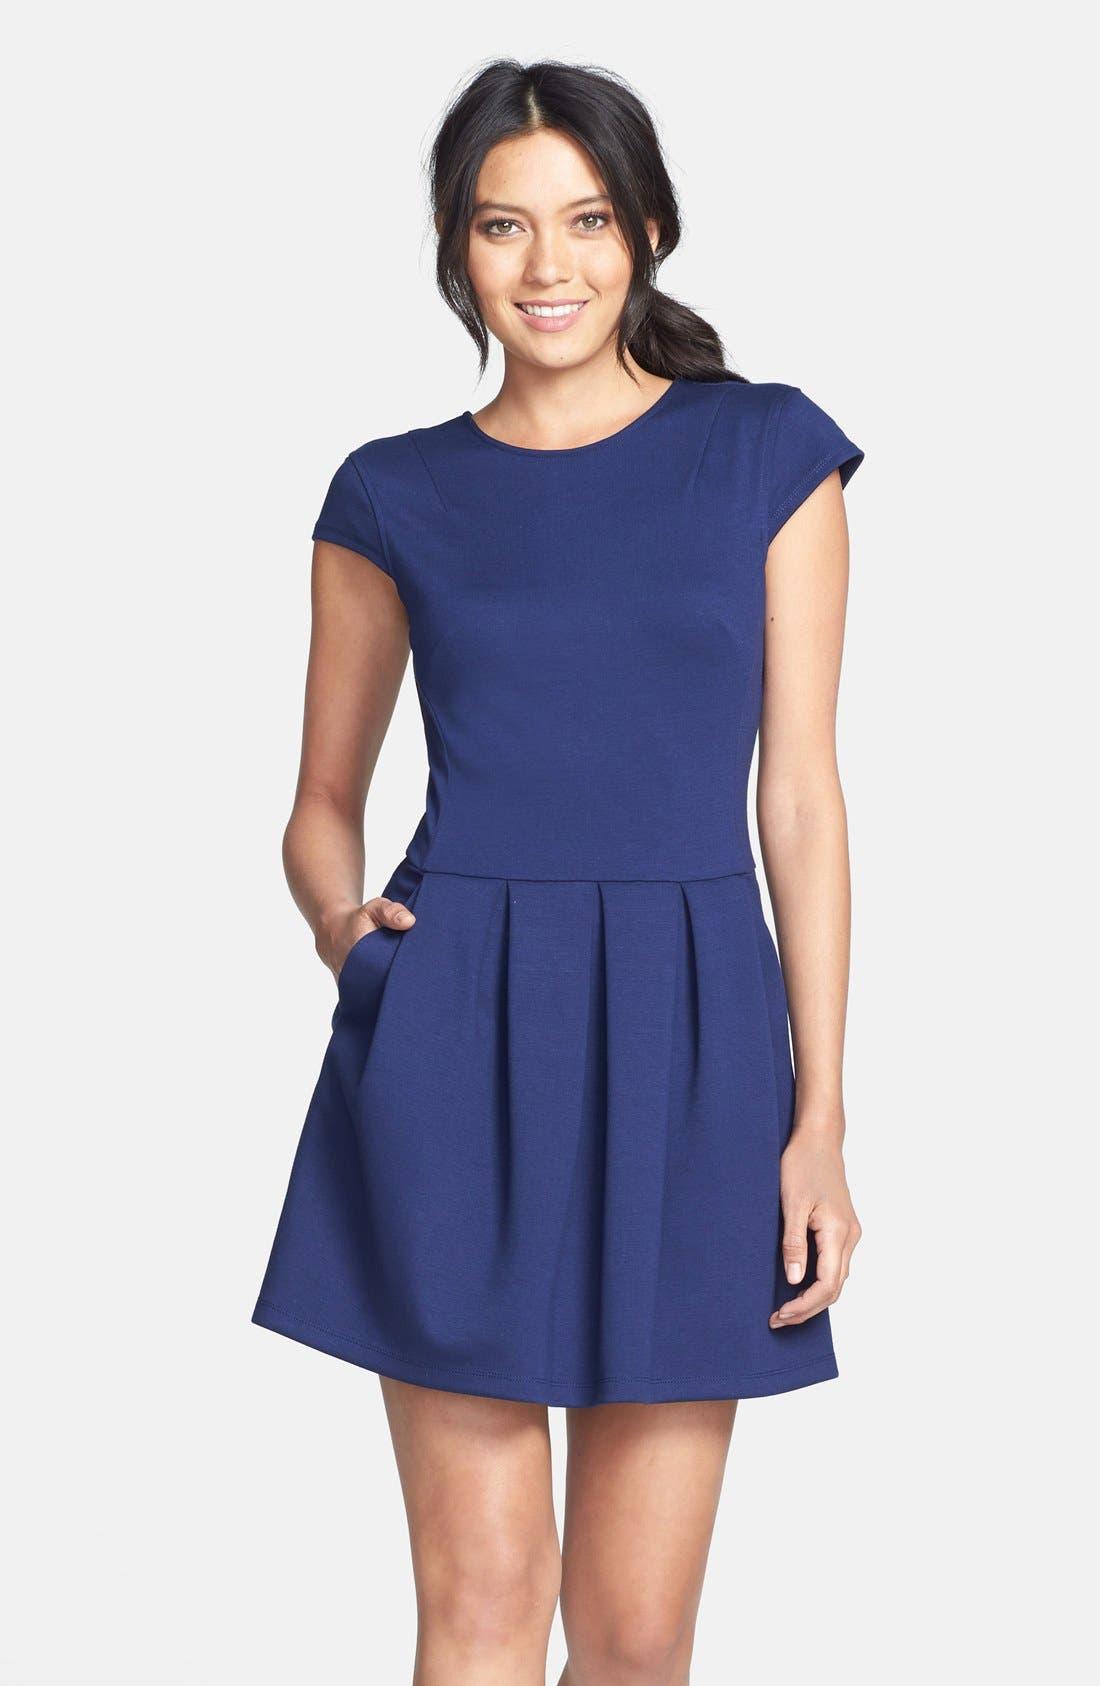 Alternate Image 1 Selected - Black Swan Cap Sleeve Ponte Knit Fit & Flare Dress